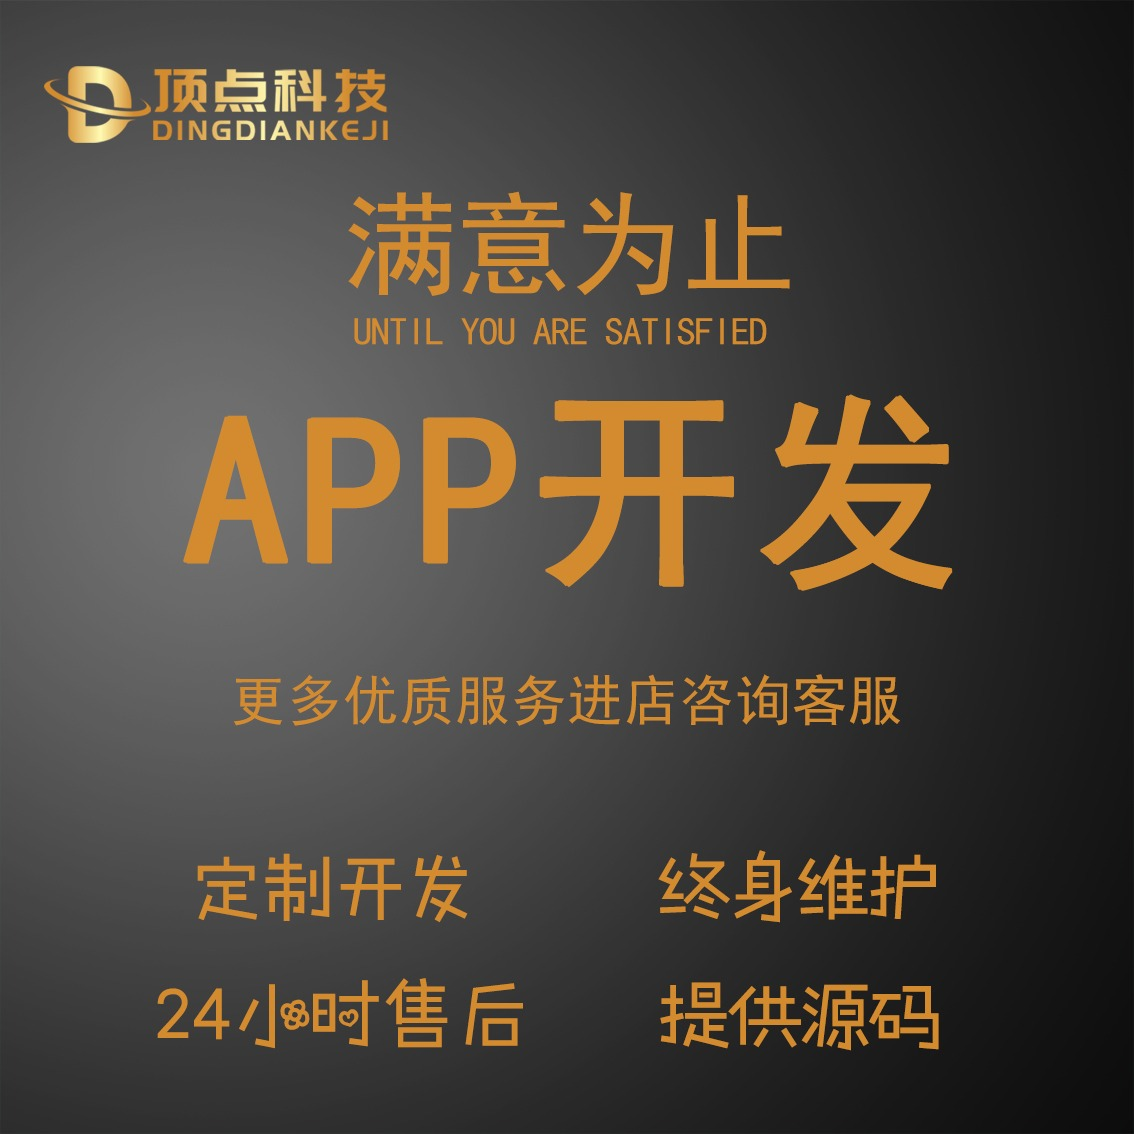 【APP开发公司】行业系统定制/新零售/电商/社交/定制开发